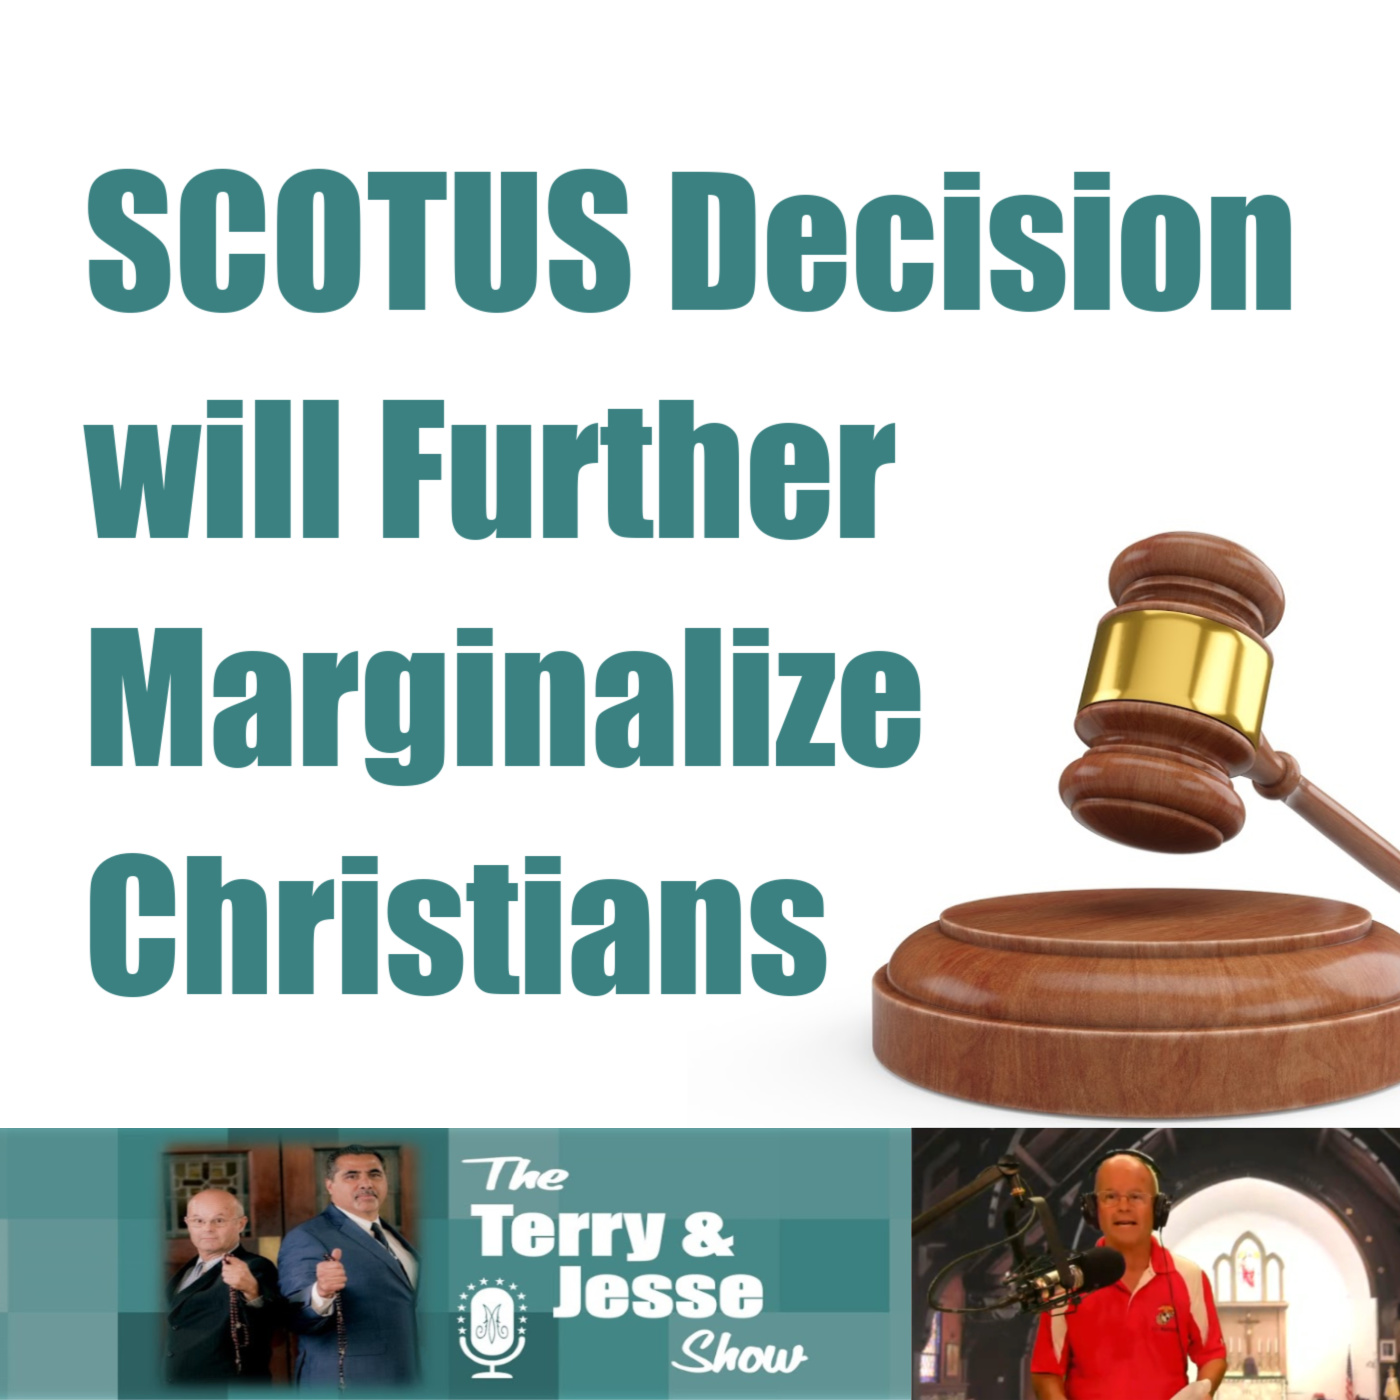 19 Jun 2020 – Supreme Court Decision will Further Marginalize Christians